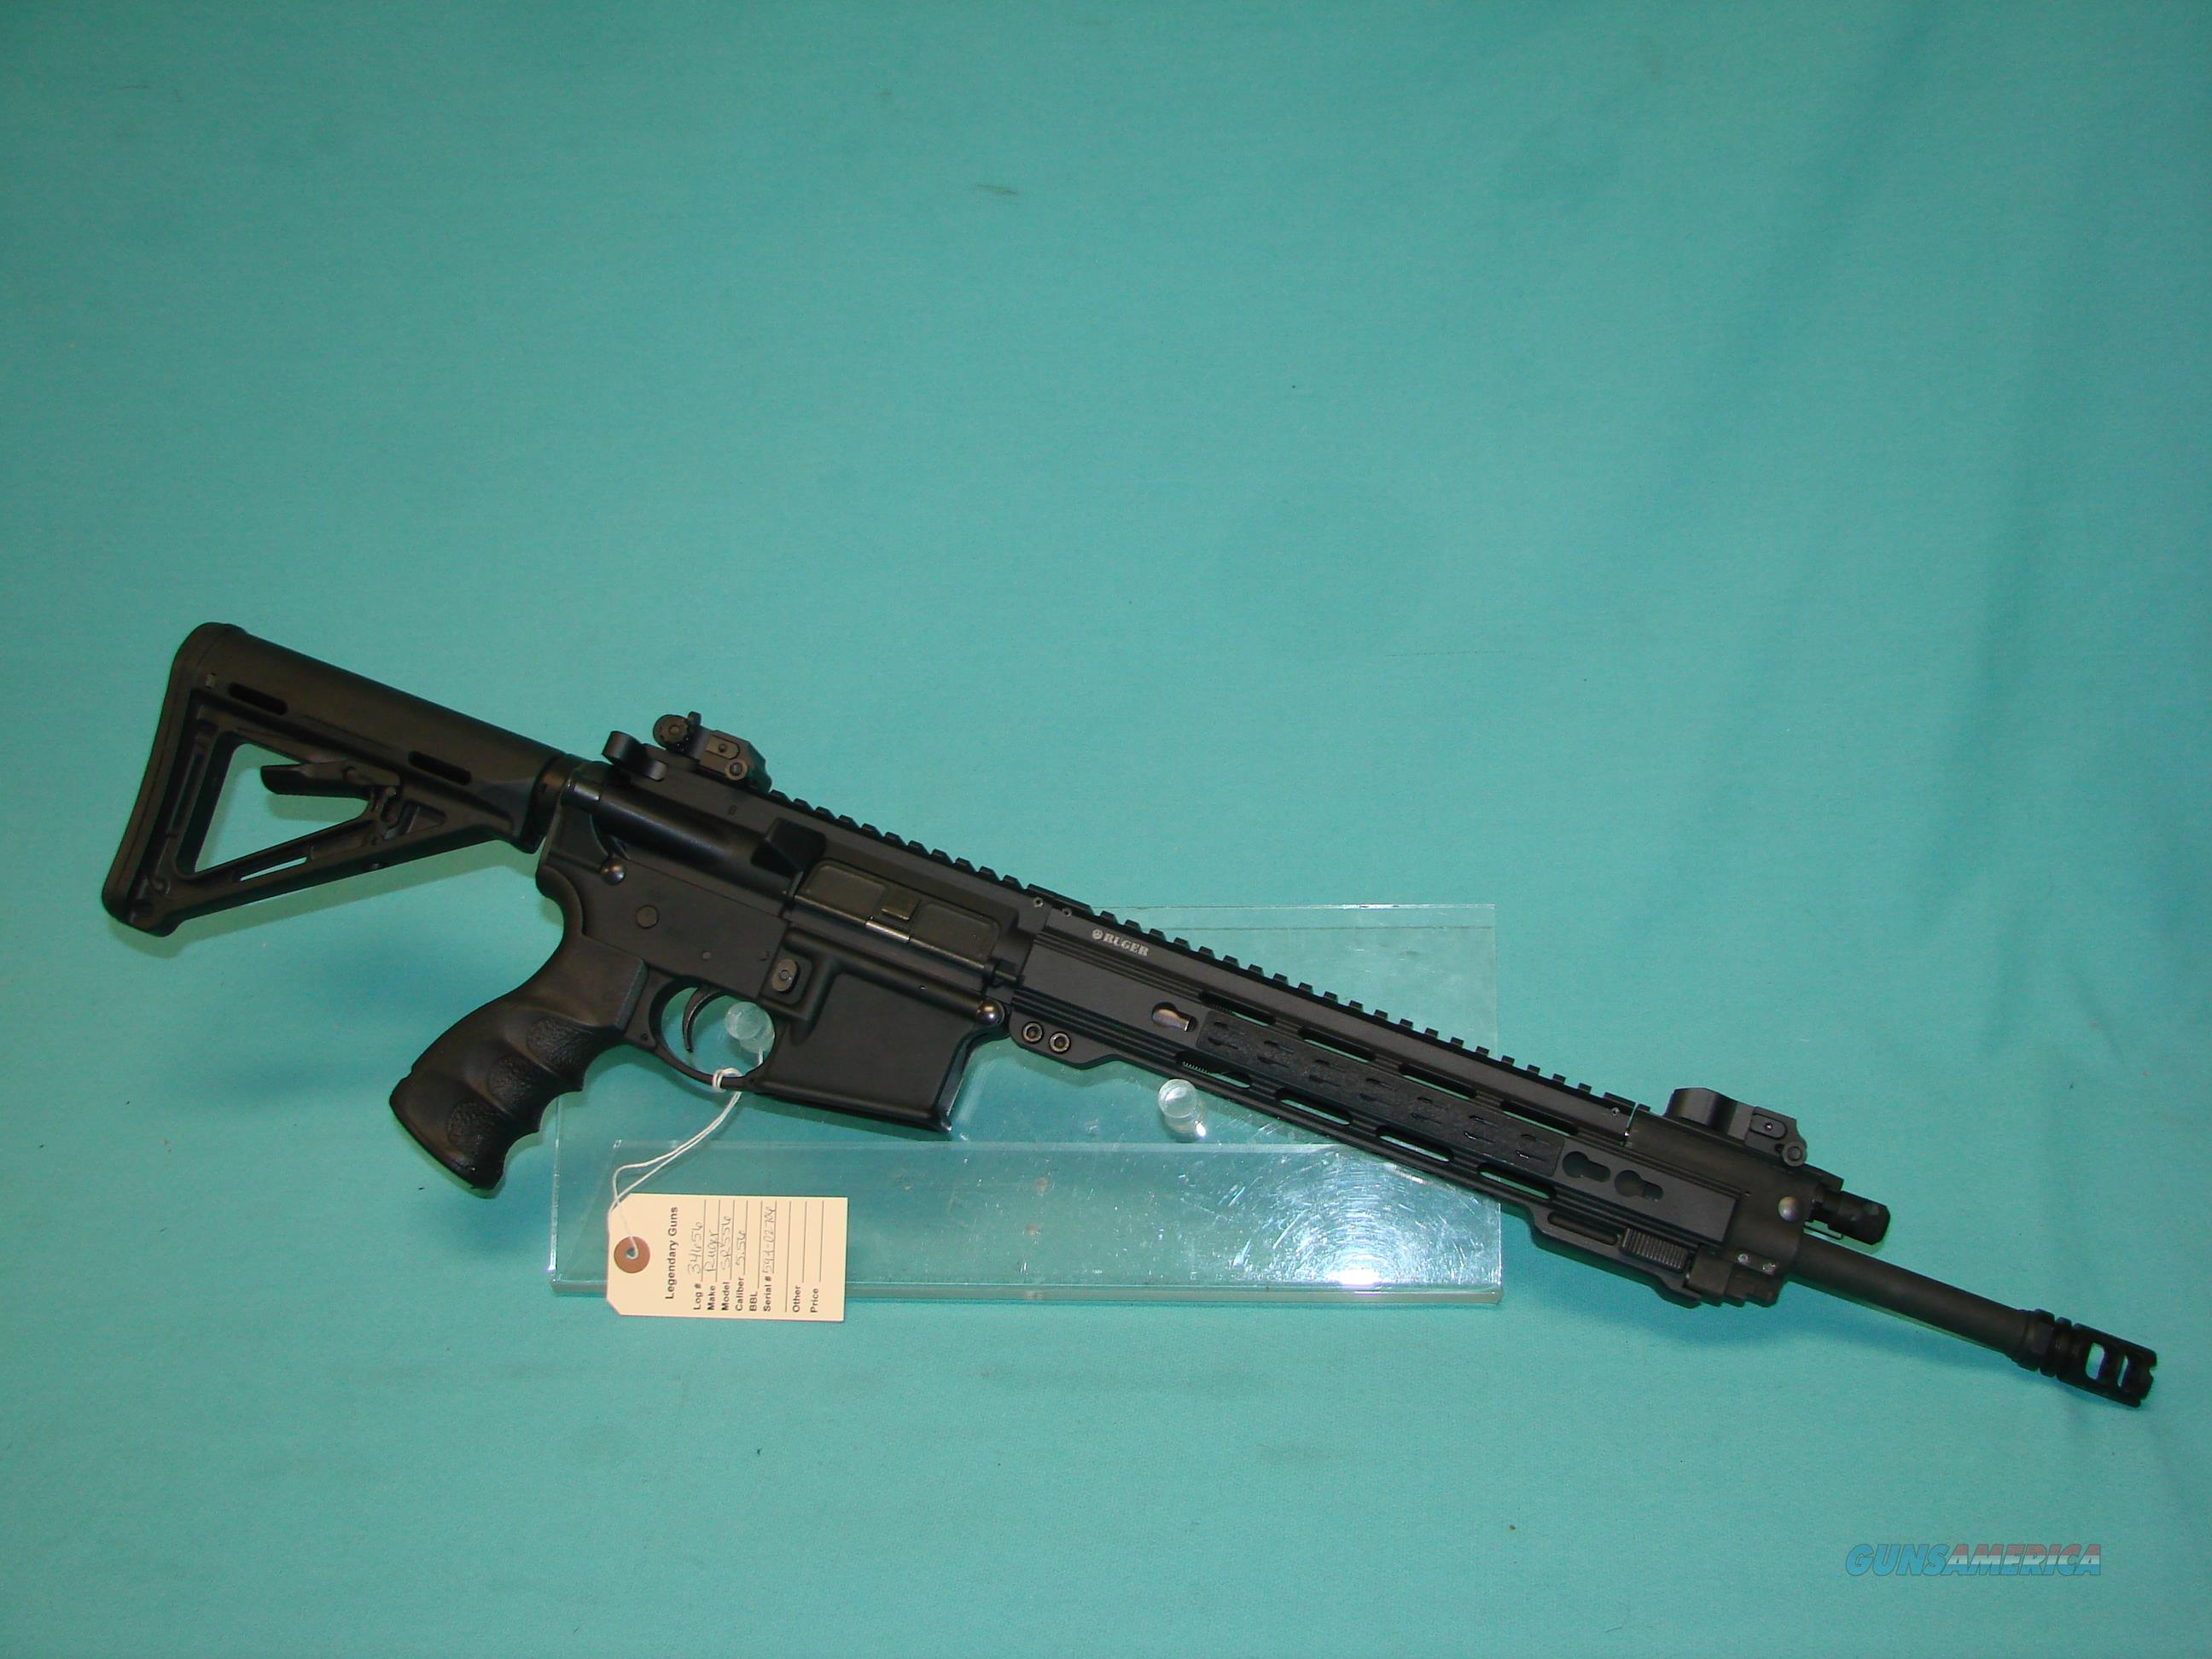 Ruger SR556  Guns > Rifles > Ruger Rifles > AR Series